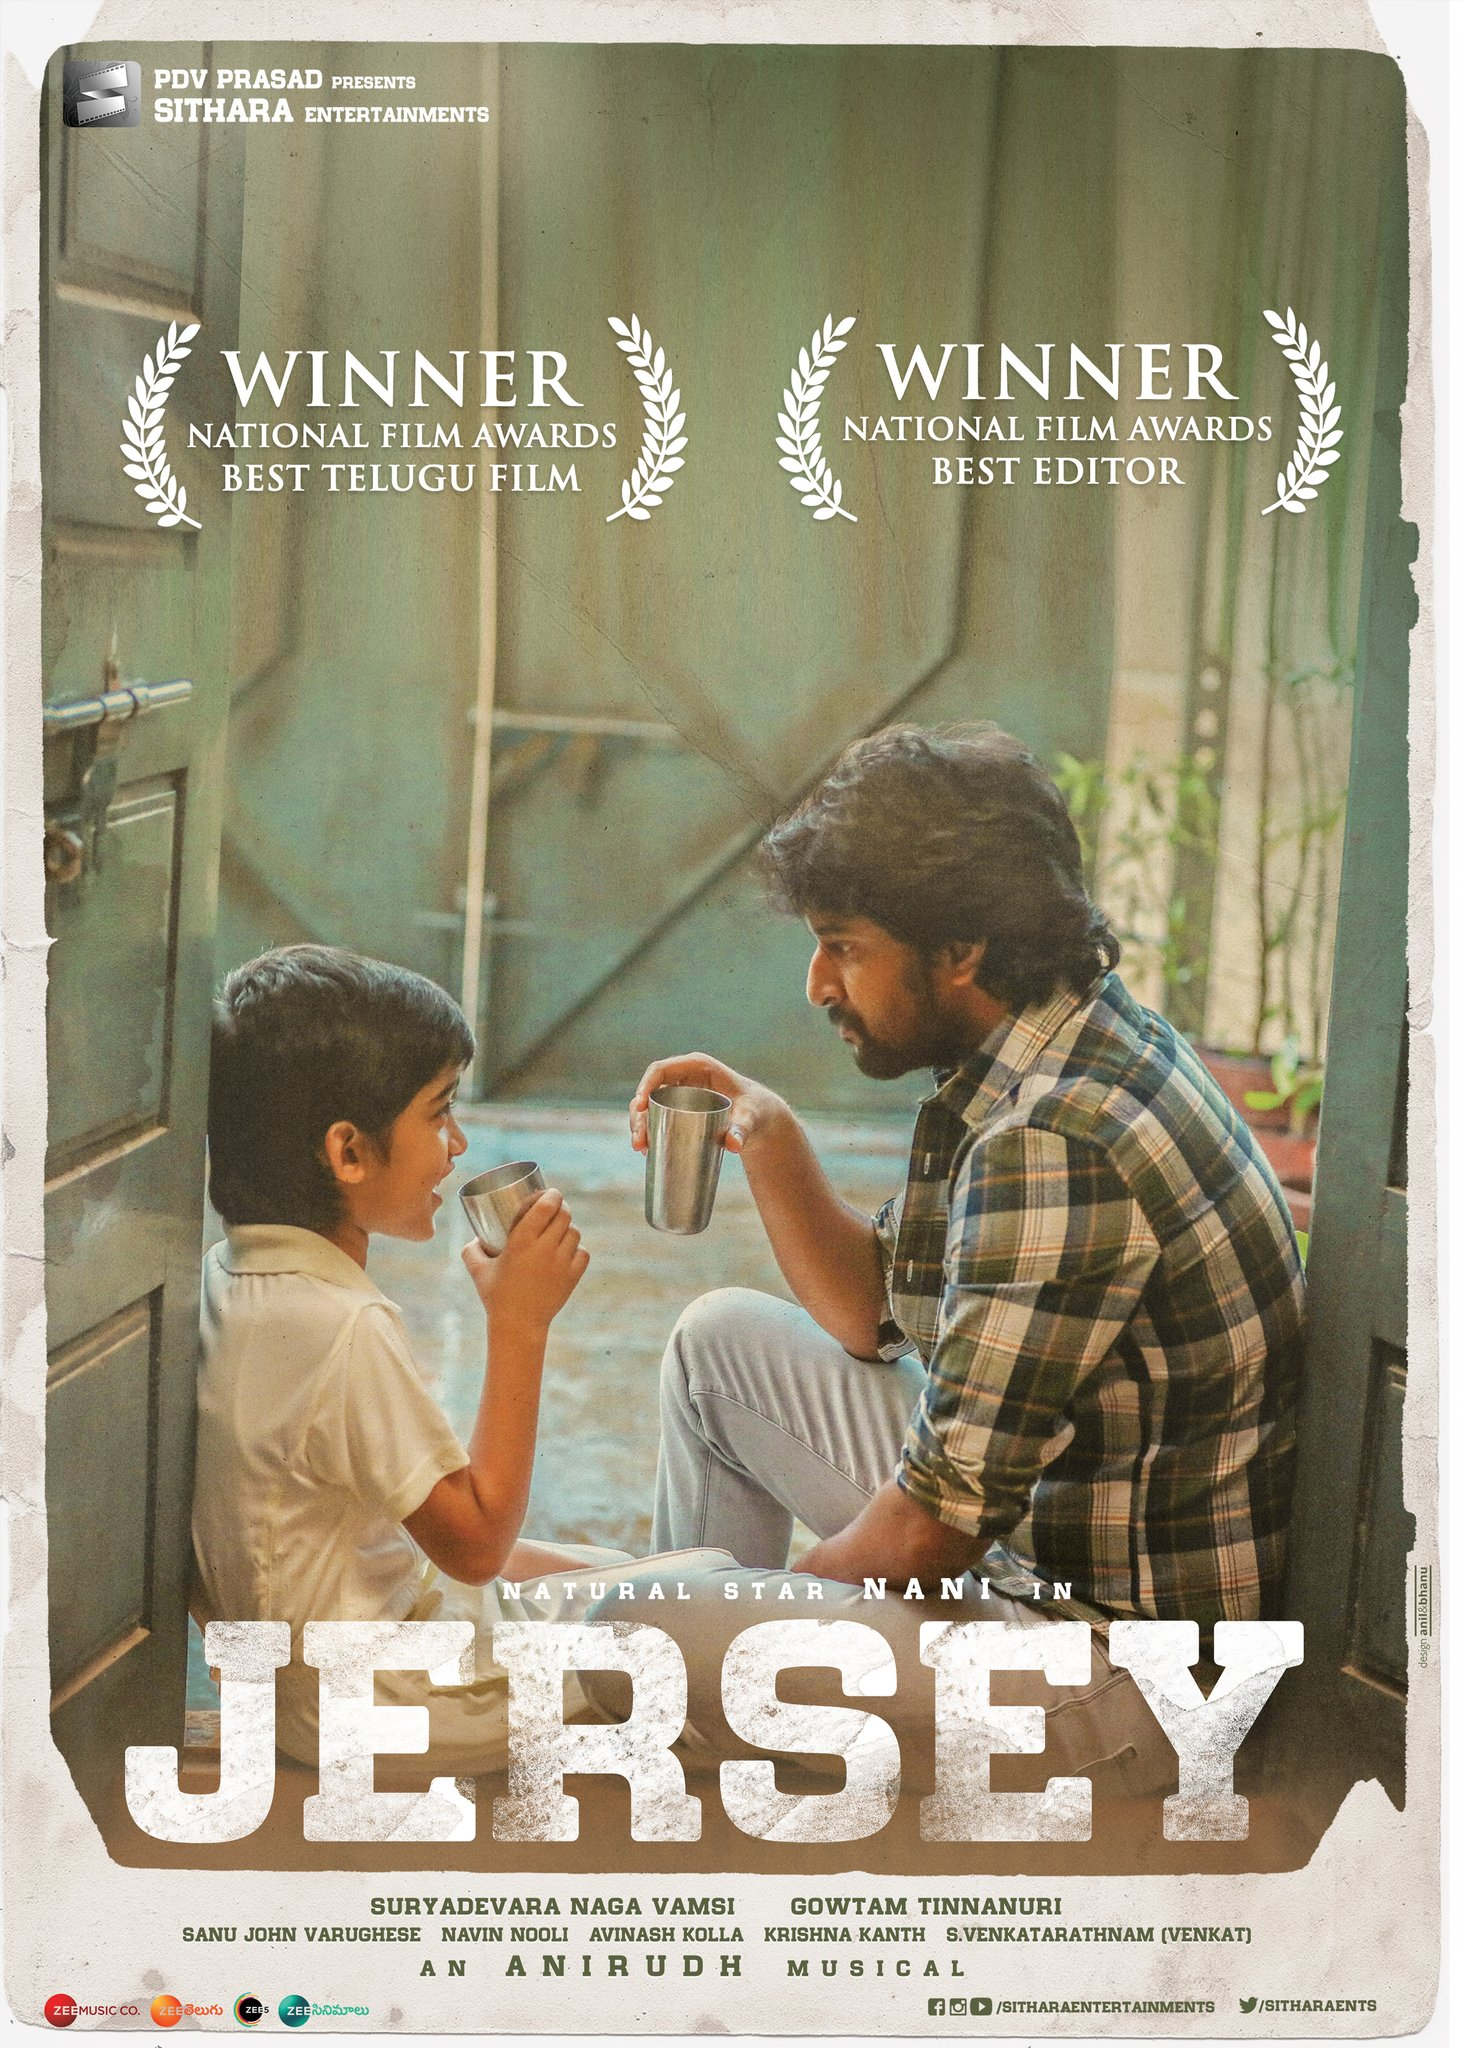 Congratulations for 67 National Film Awards from Tollywood #Jersey  ⭐Best Telugu Film Regional Category ⭐Best Editing - Navin Nooli  #NationalFilmAwards Sithara Entertainment Nani #ManaRadio